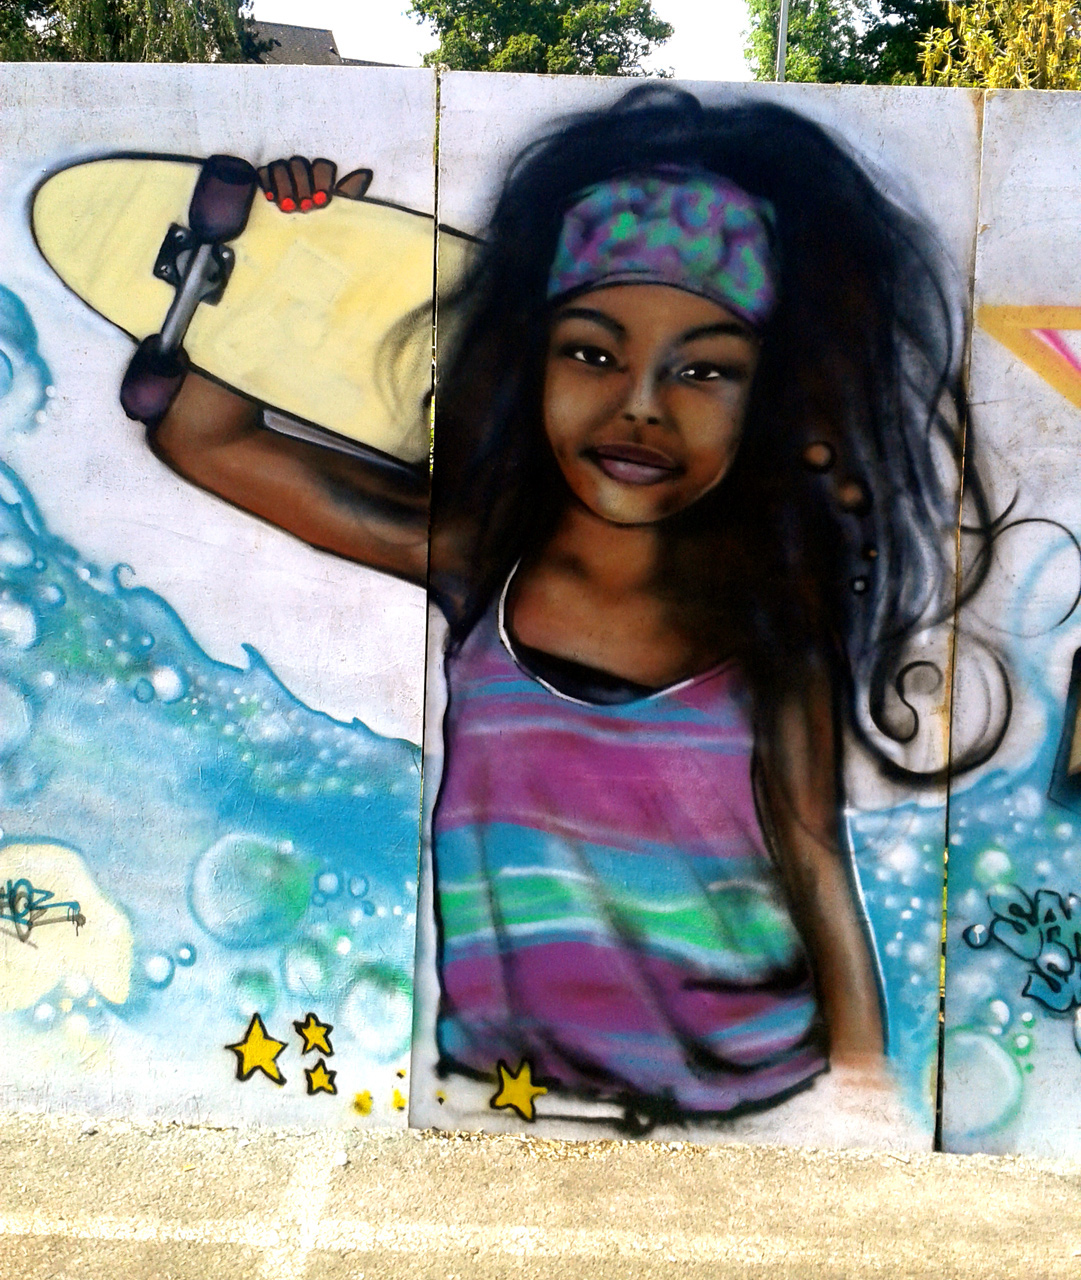 Fresque Graffiti Skate Park Quimper